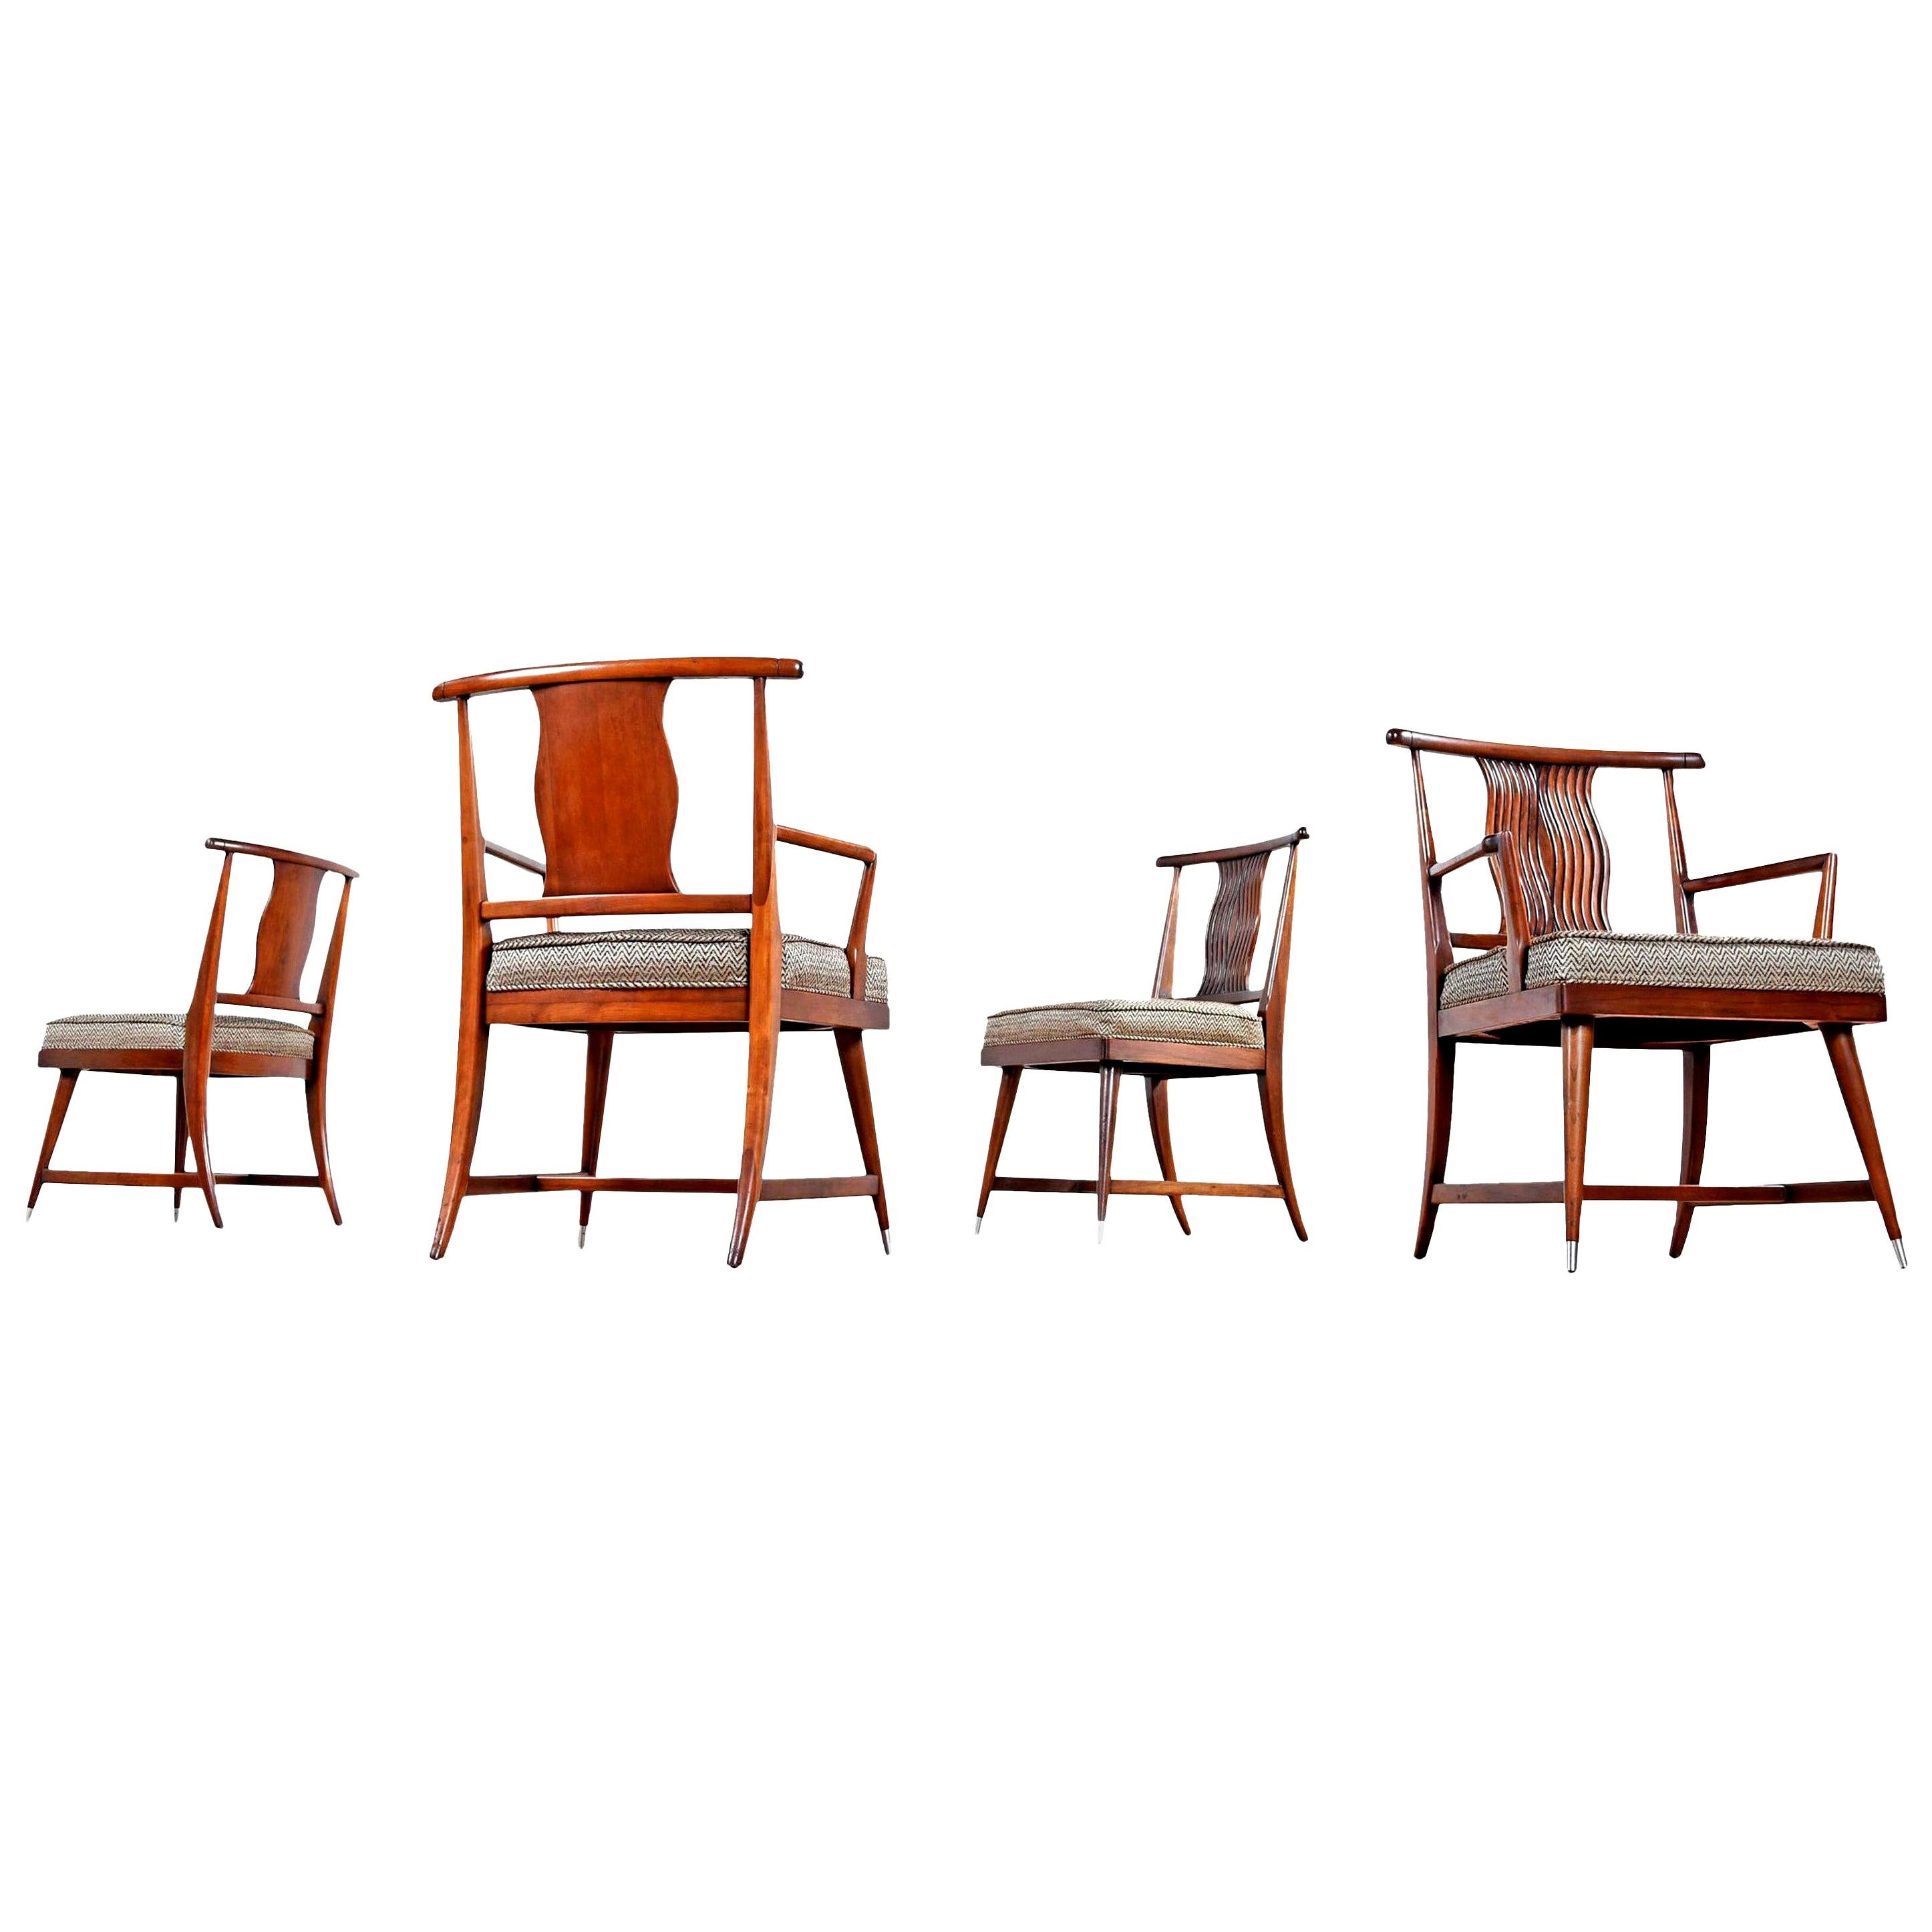 T.H. Robsjohn-Gibbings Style Eastern Influence Mahogany Dining Chairs